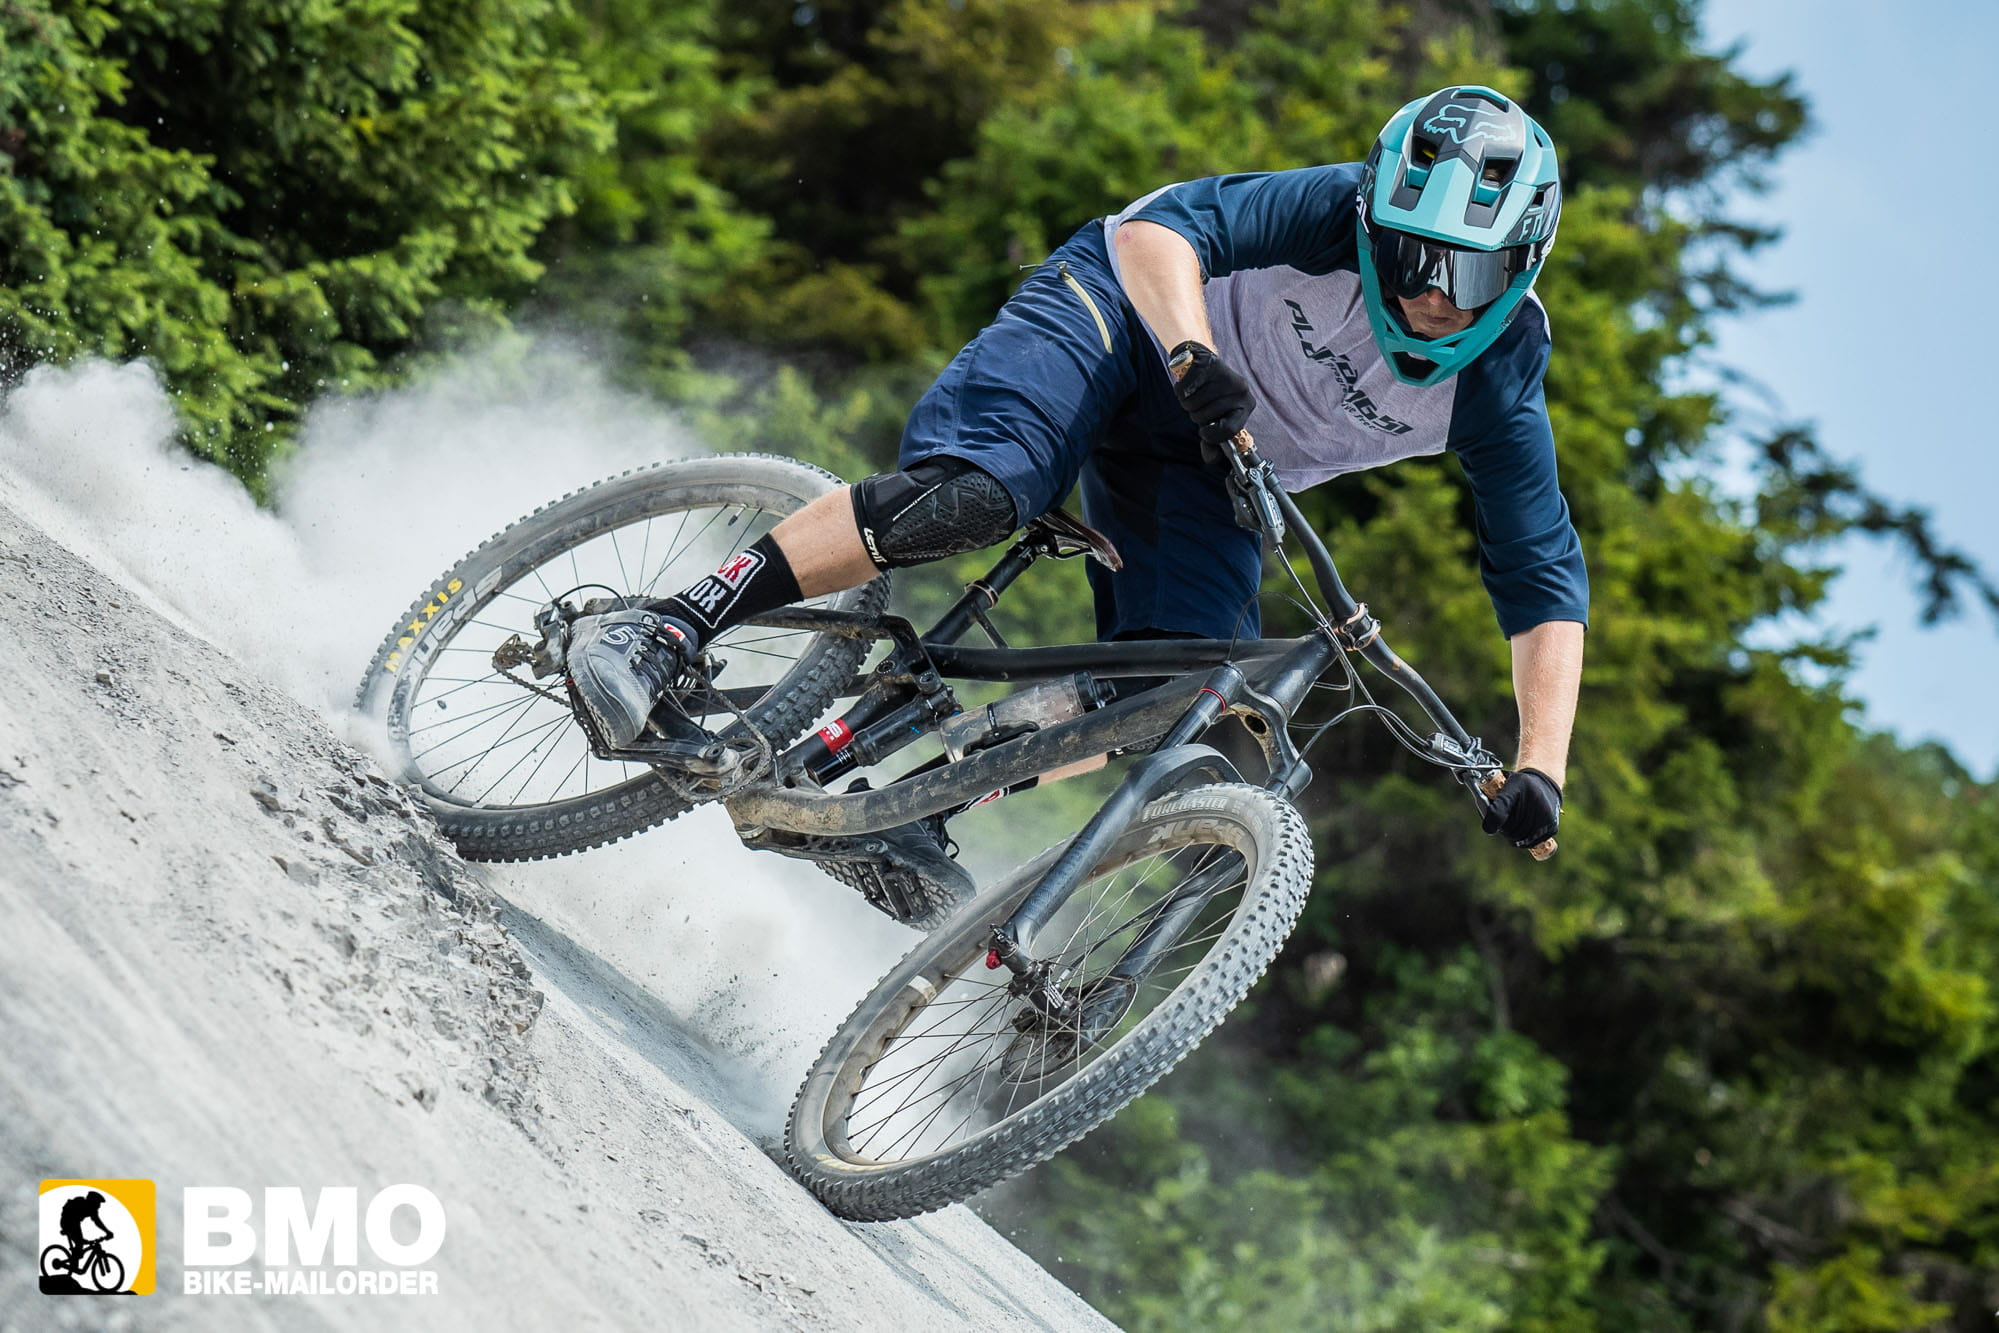 BMO-Bike-Mailorder-Fox-Proframe-5